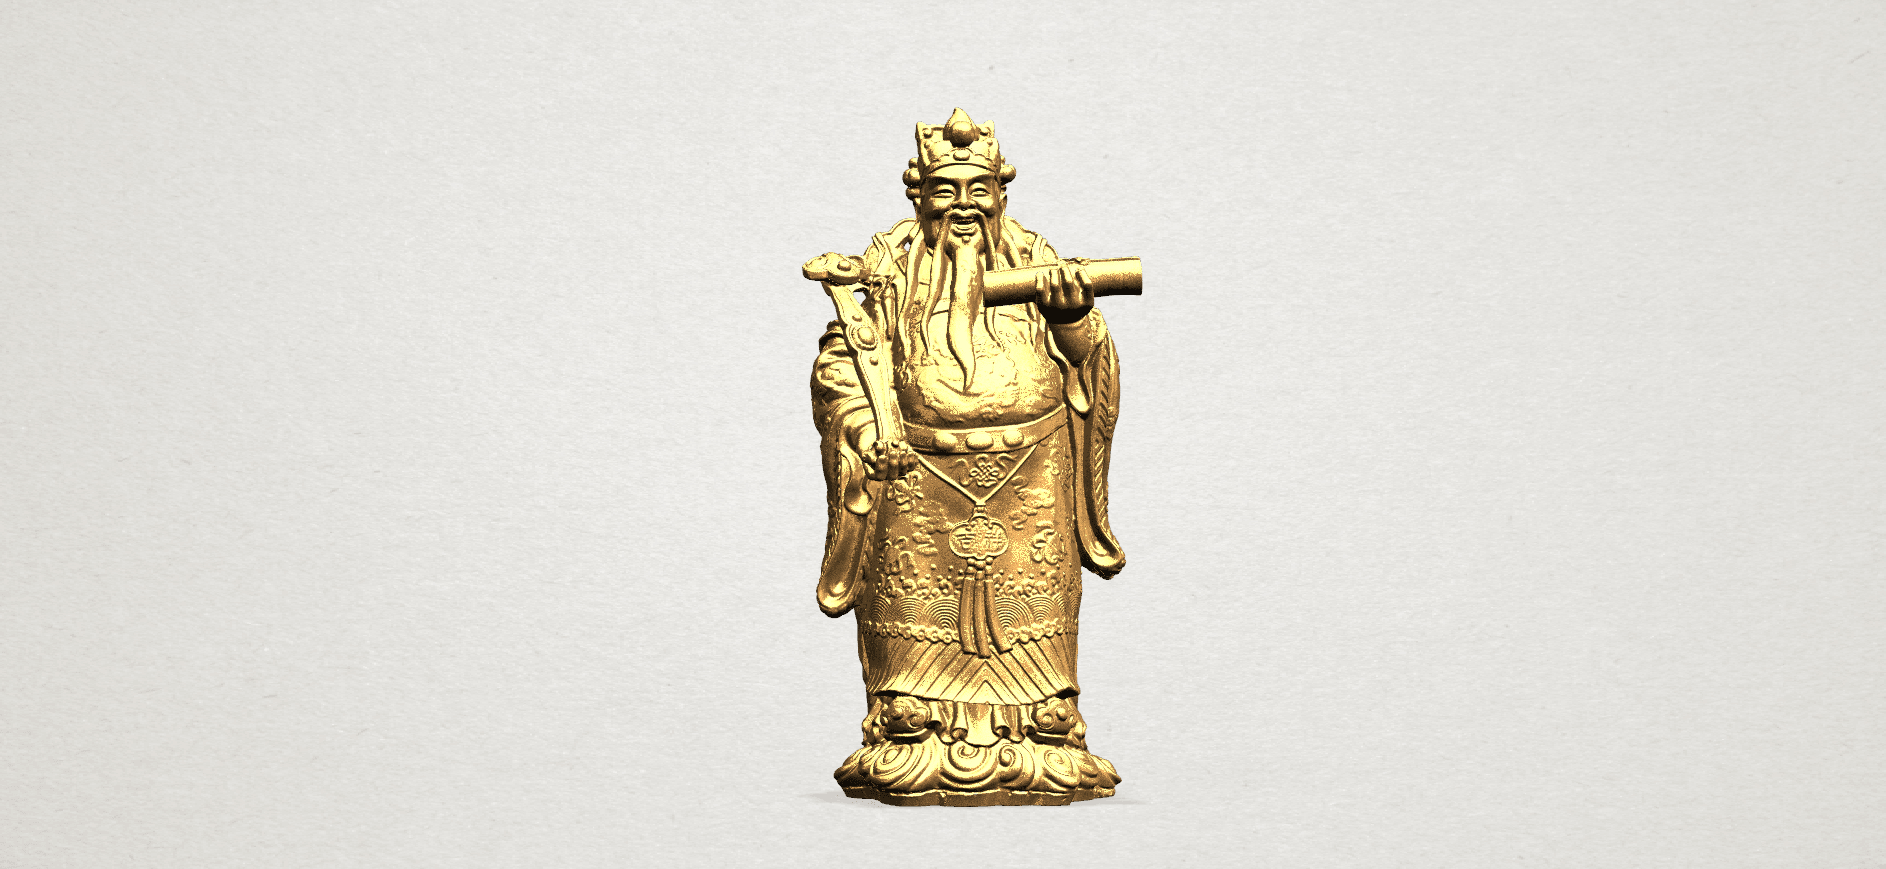 God of Treasure - B01.png Download free STL file God of Treasure • 3D printing model, GeorgesNikkei